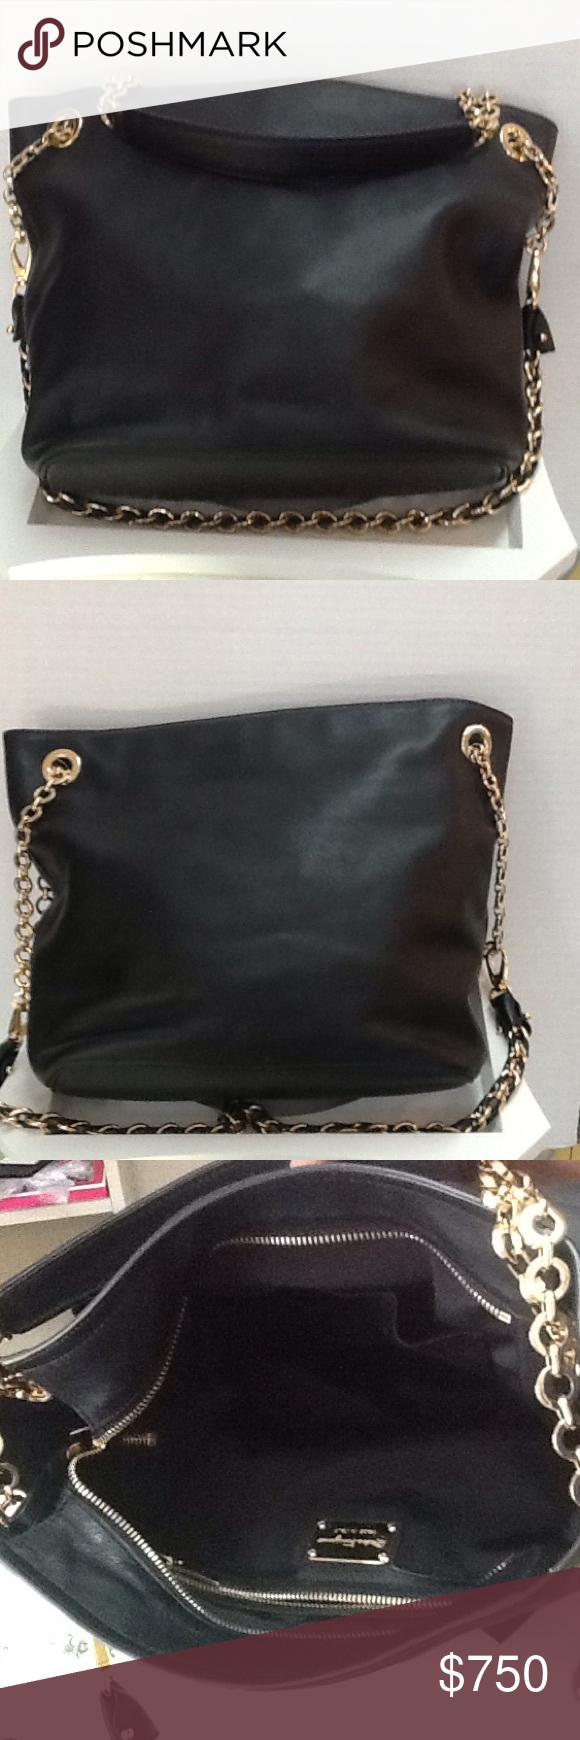 "Authentic Salvatore Ferragamo Malia Handbag Pre-owned in excellent condition. Authentic Ferragamo Malia Handbag with Gold Hadware..14.5"" lenght x 11"" height. Ferragamo Bags Hobos"